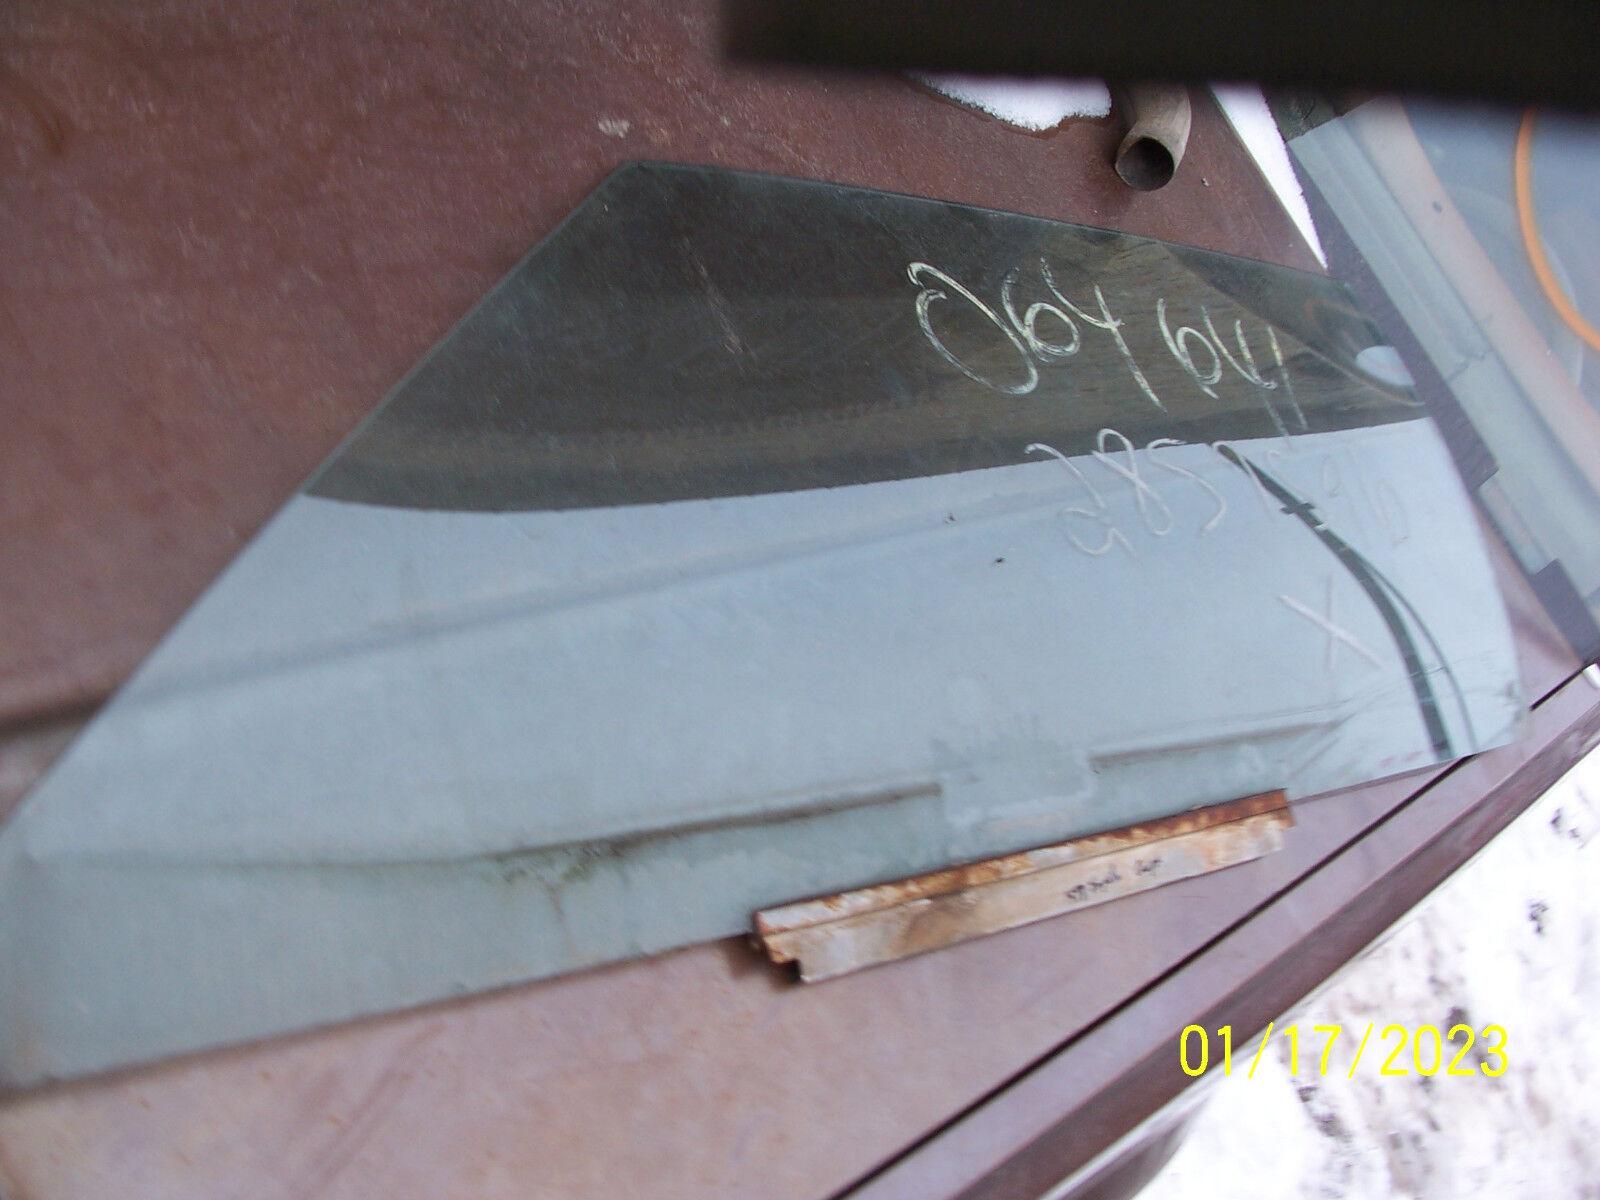 1978 1977 RIVIERA IMPALA COUPE OLDS 98 88 CATALINA LEFT DOOR WINDOW GLASS